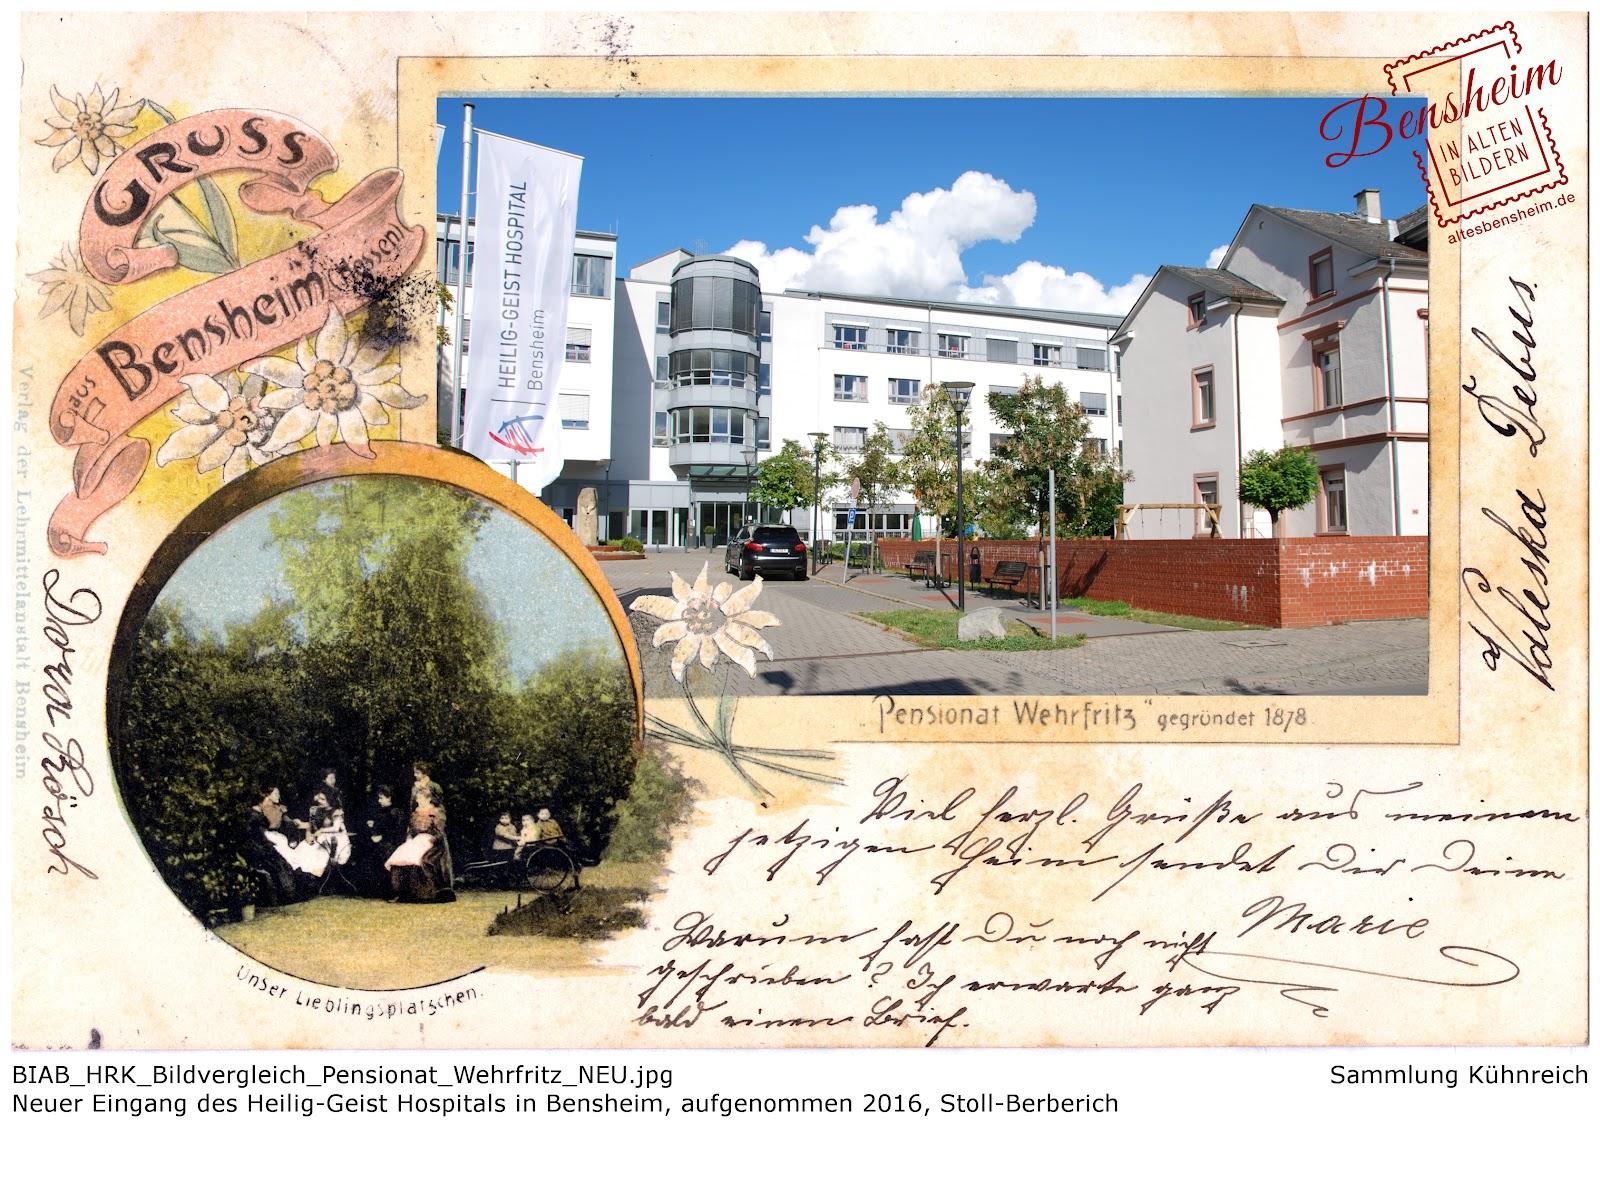 Pensionat Wehrfritz, Bildvergleich, Stoll-Berberich 2016